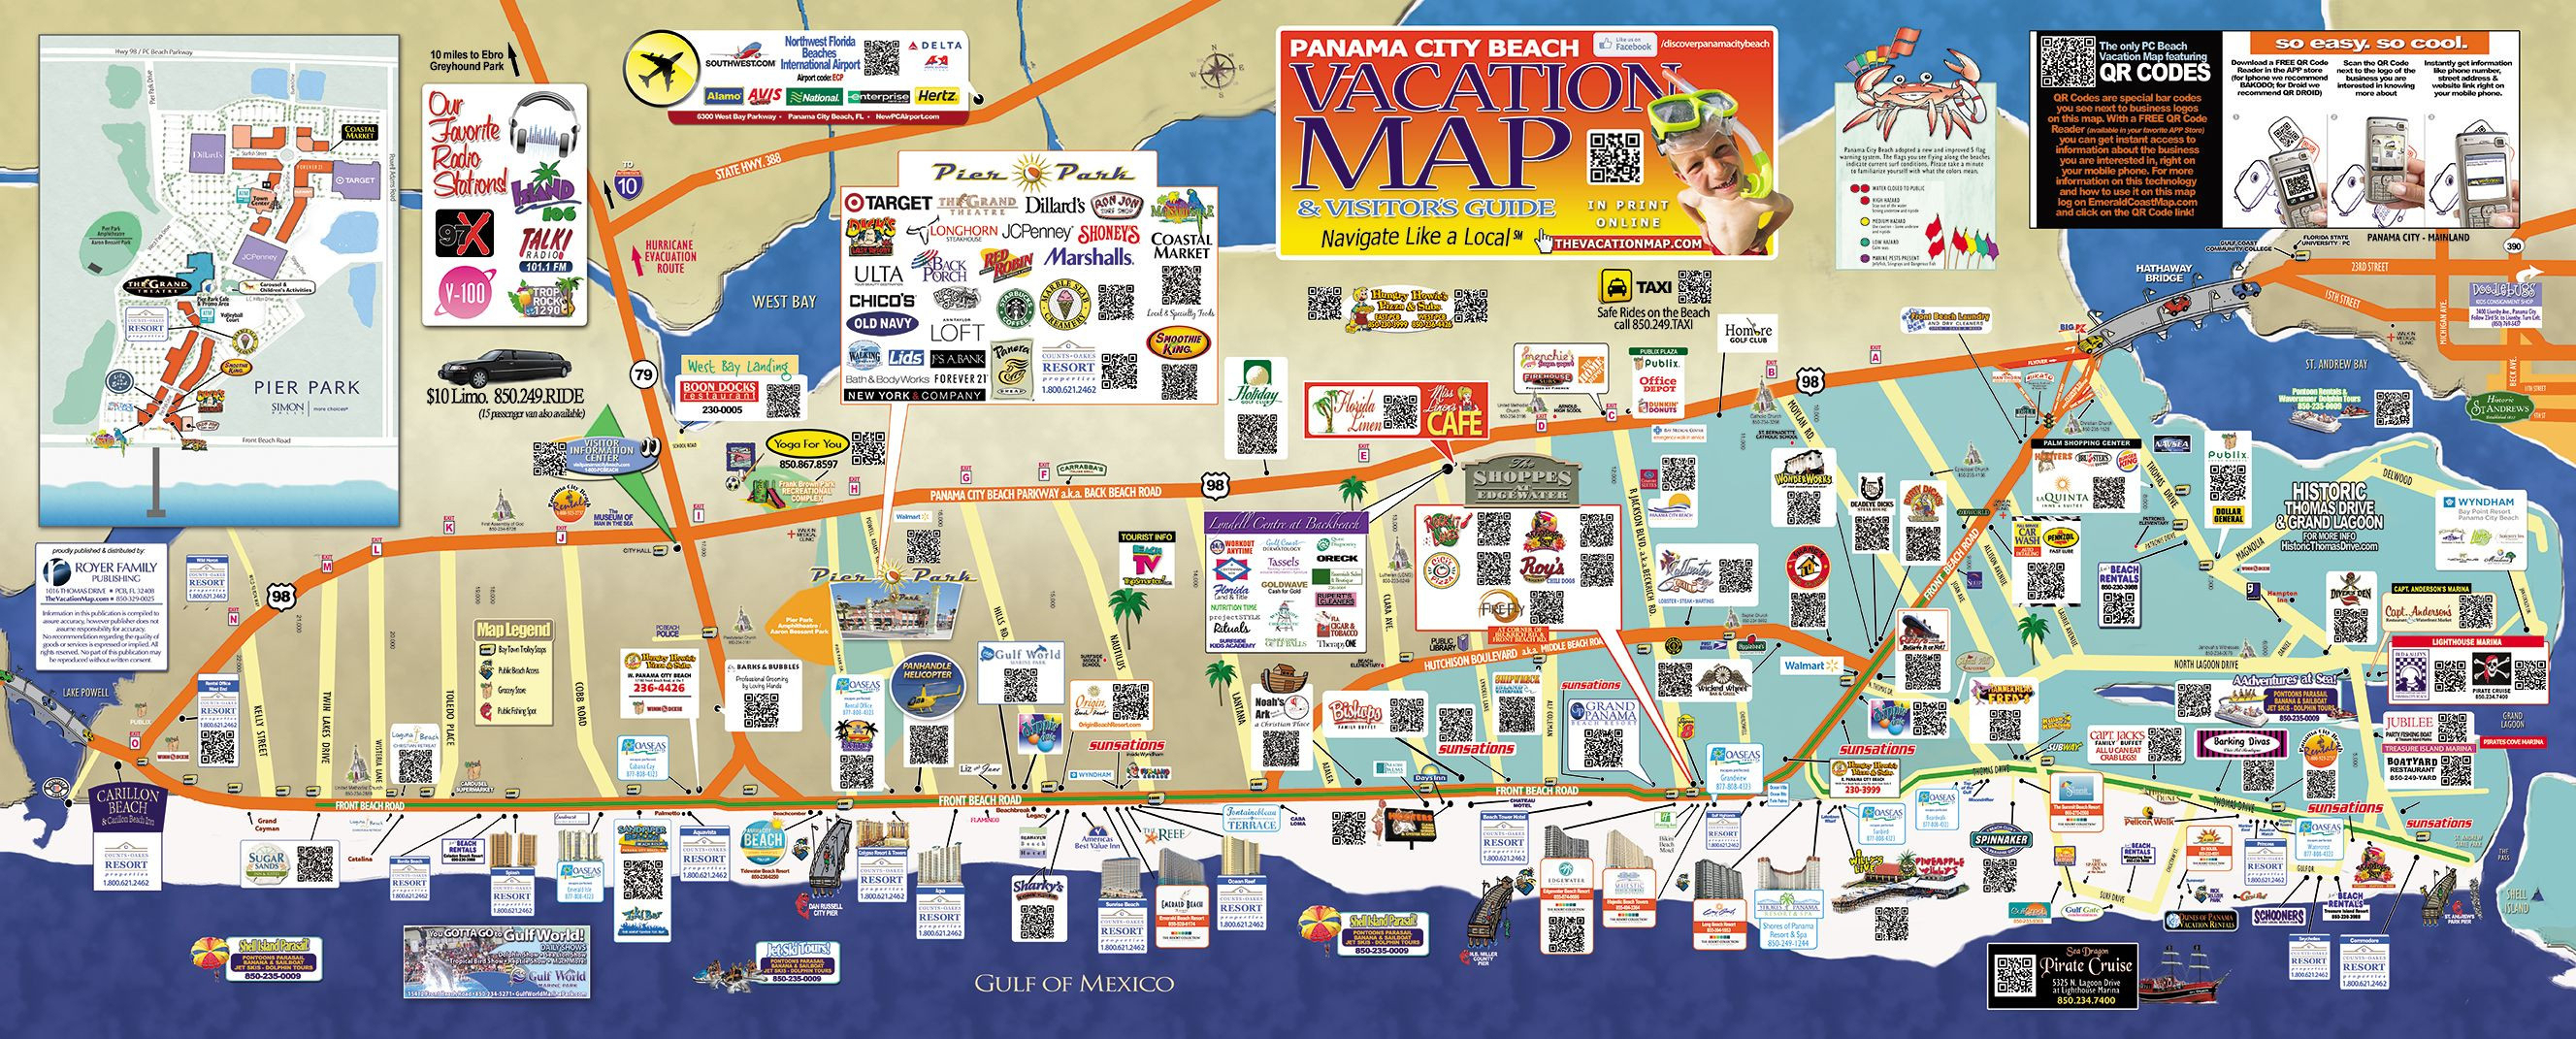 Panama City Beach Map | M88M88 - Panama City And Destin Florida Map